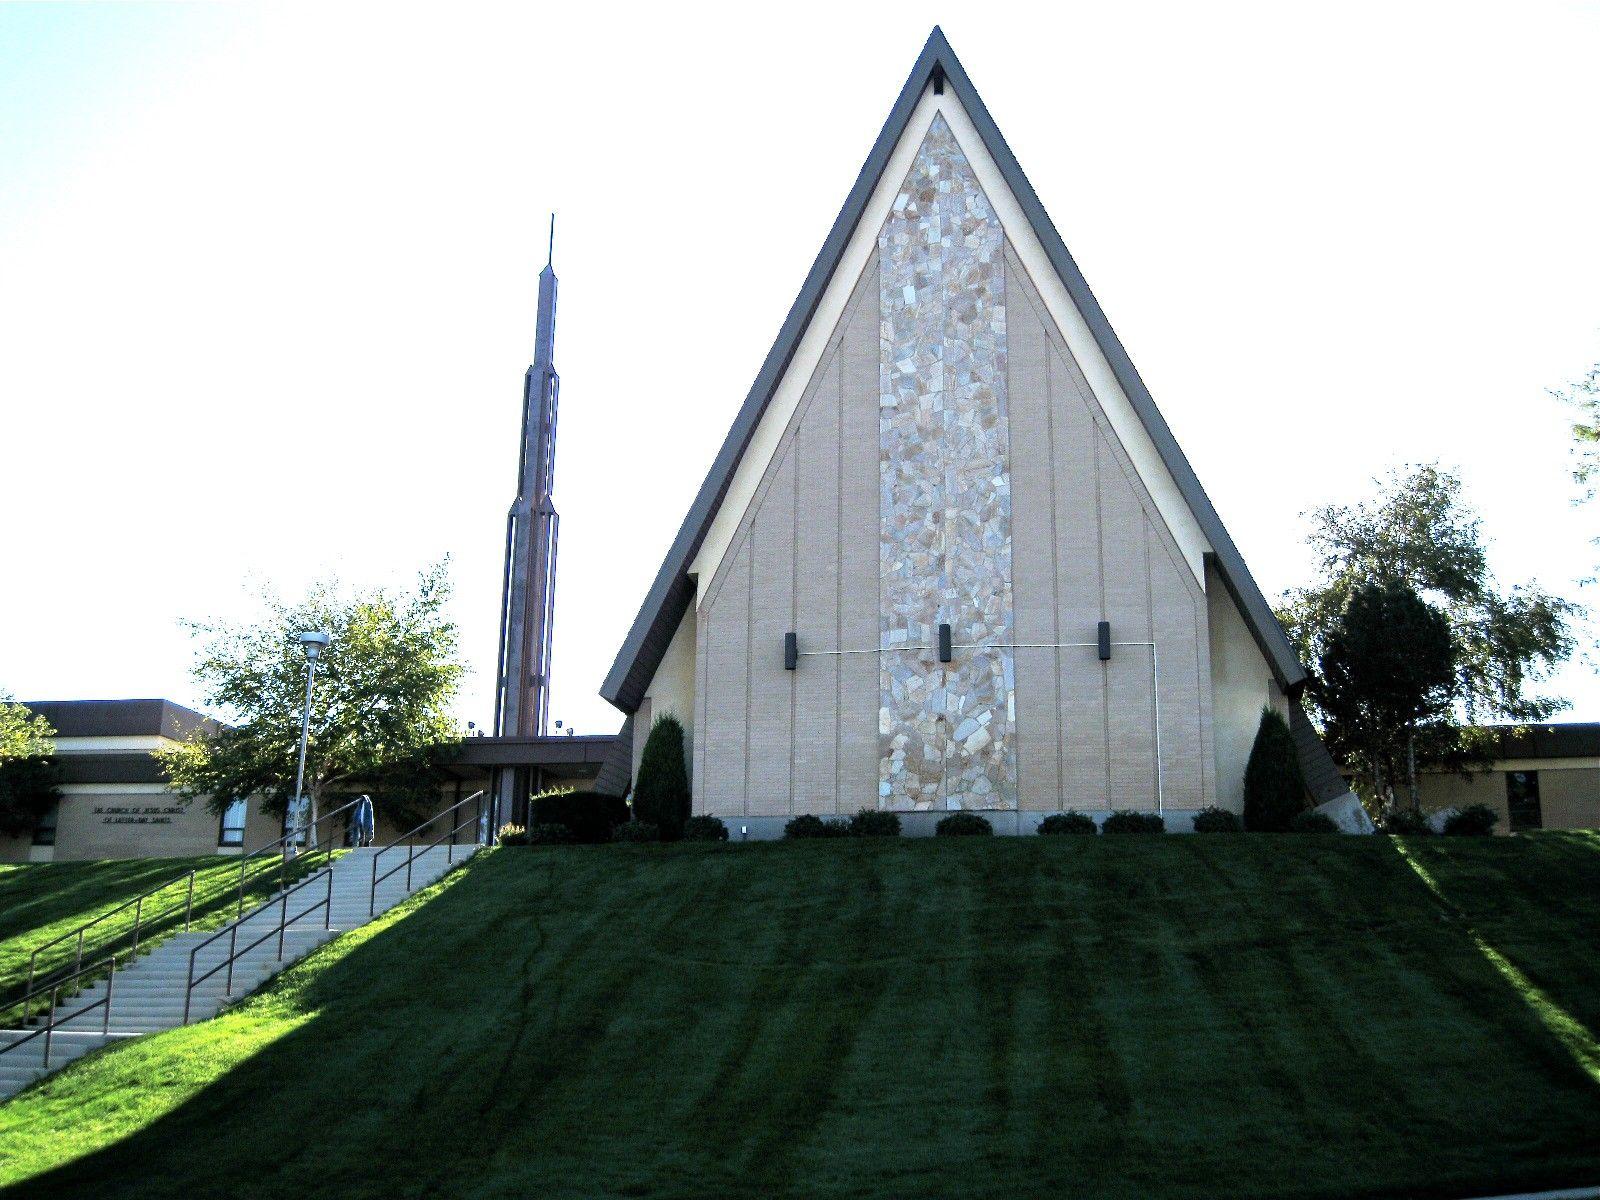 The outside of a chapel in Bountiful, Utah.